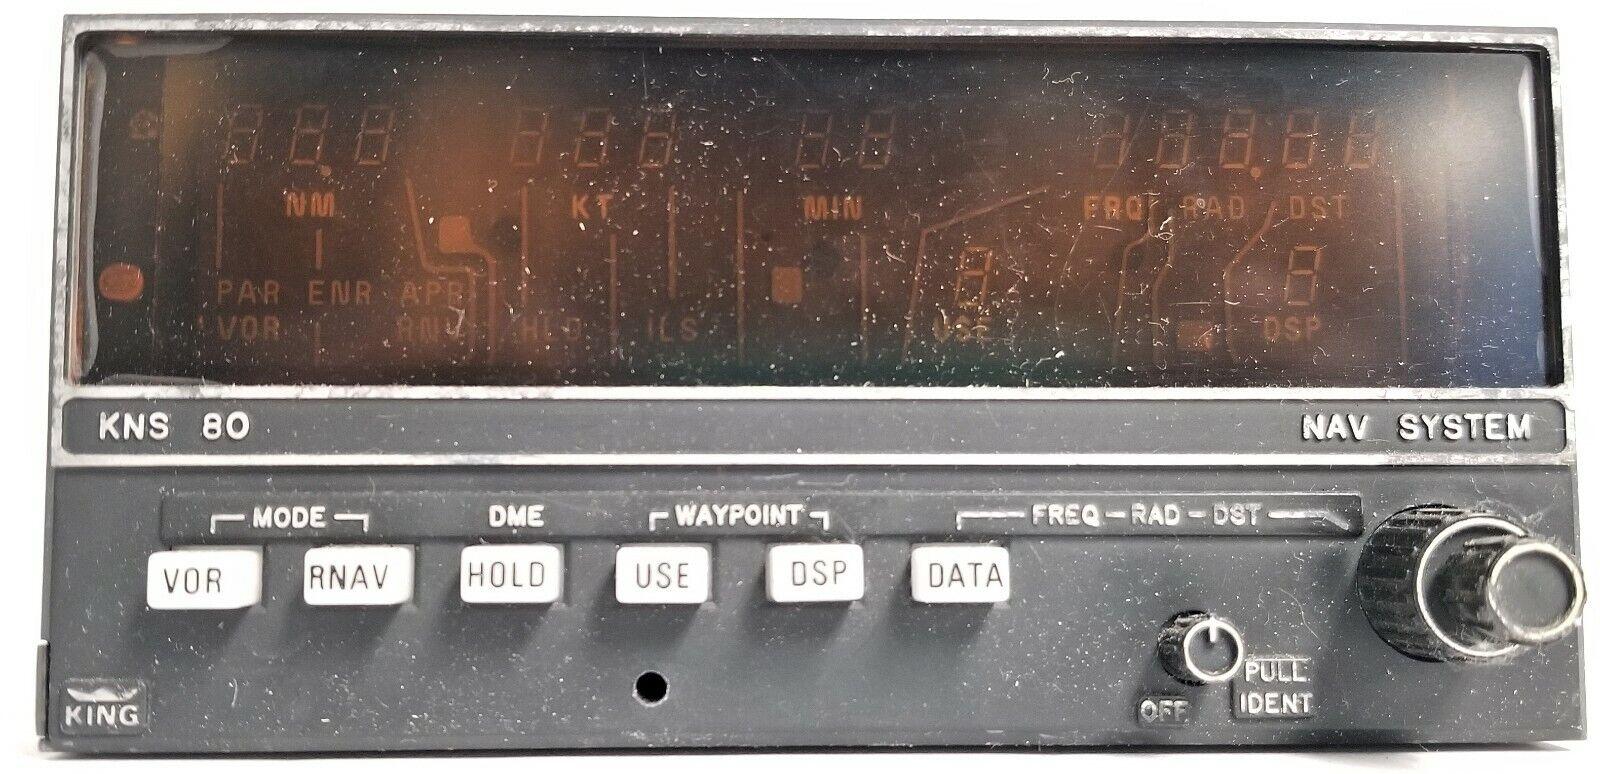 066-4008-00  KNS 80 NAV SYSTEM VOR/LOC/DME/RNAV/GS